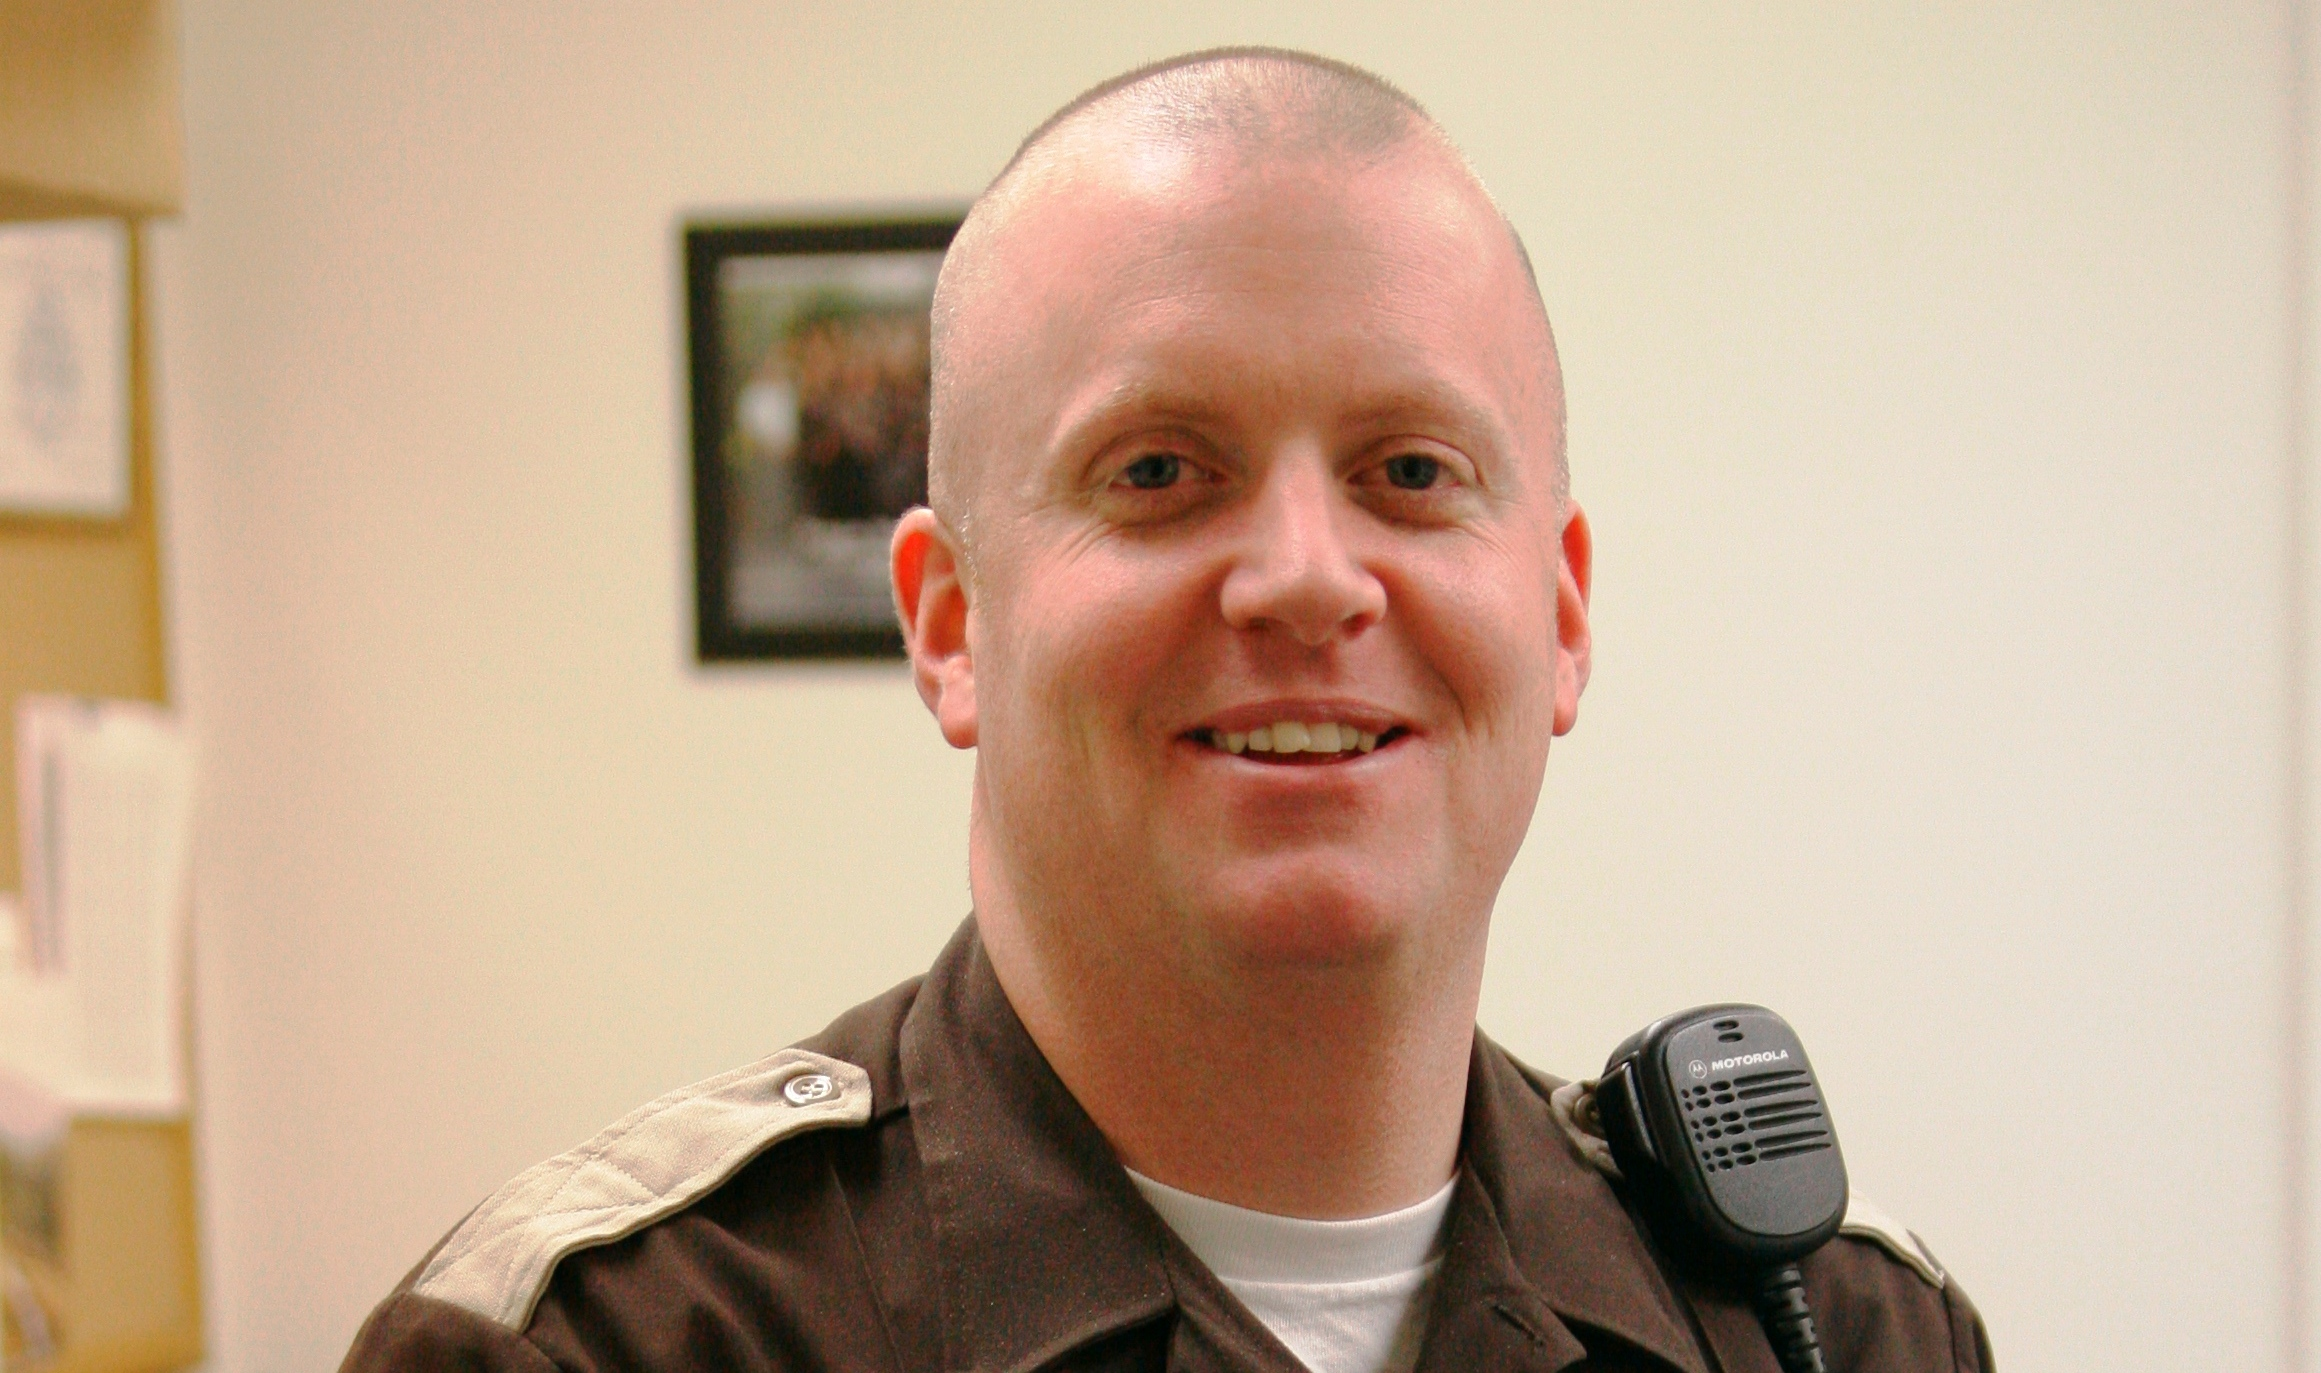 Deputy Kelly James Fredinburg | Marion County Sheriff's Office, Oregon